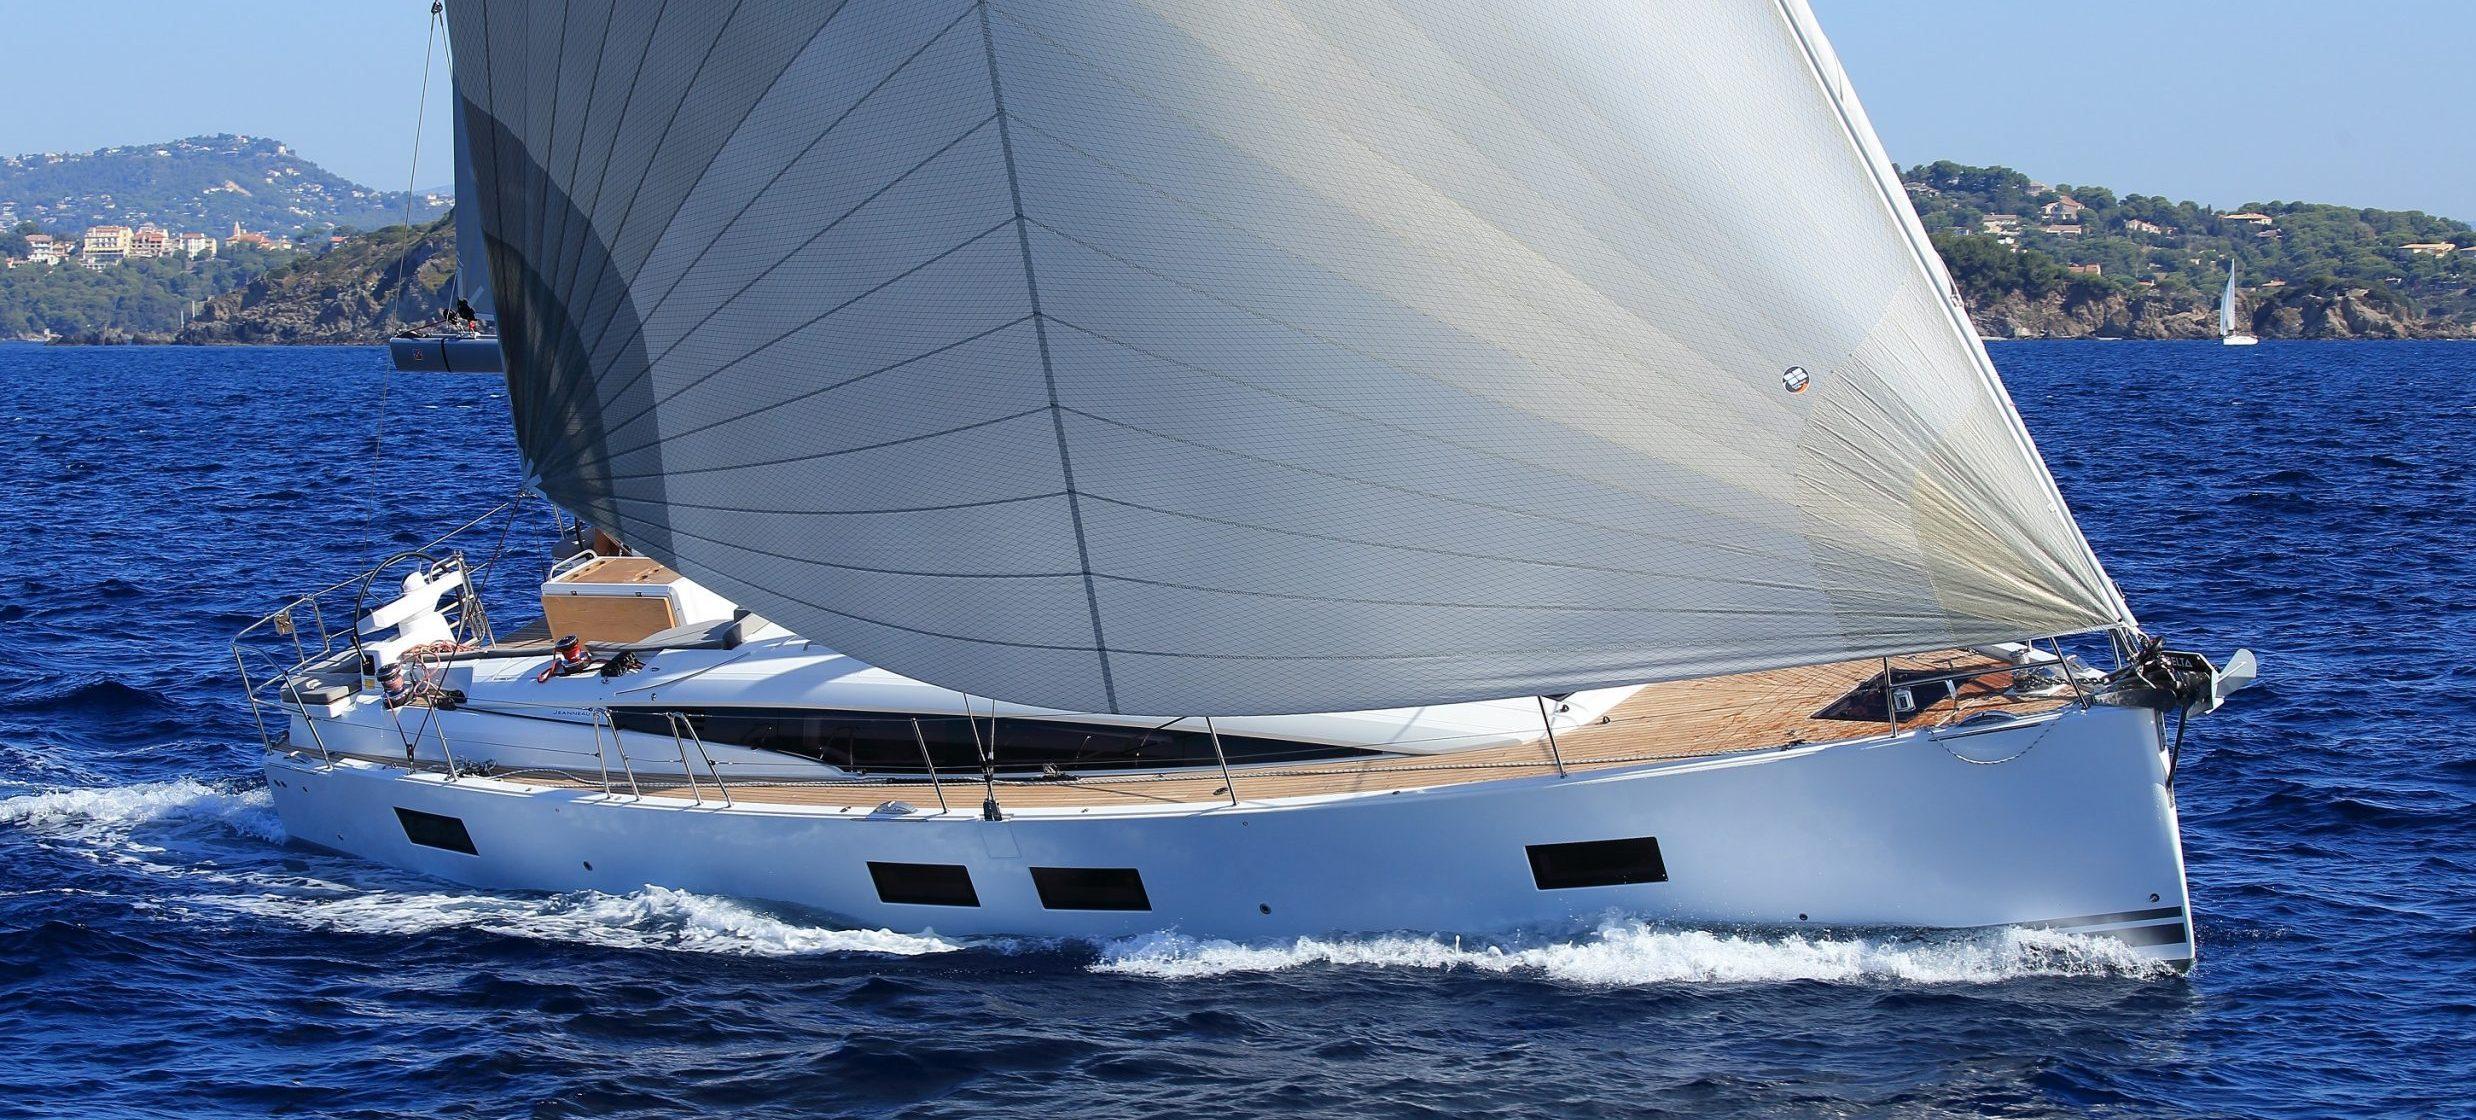 Jeanneau 51 open sail